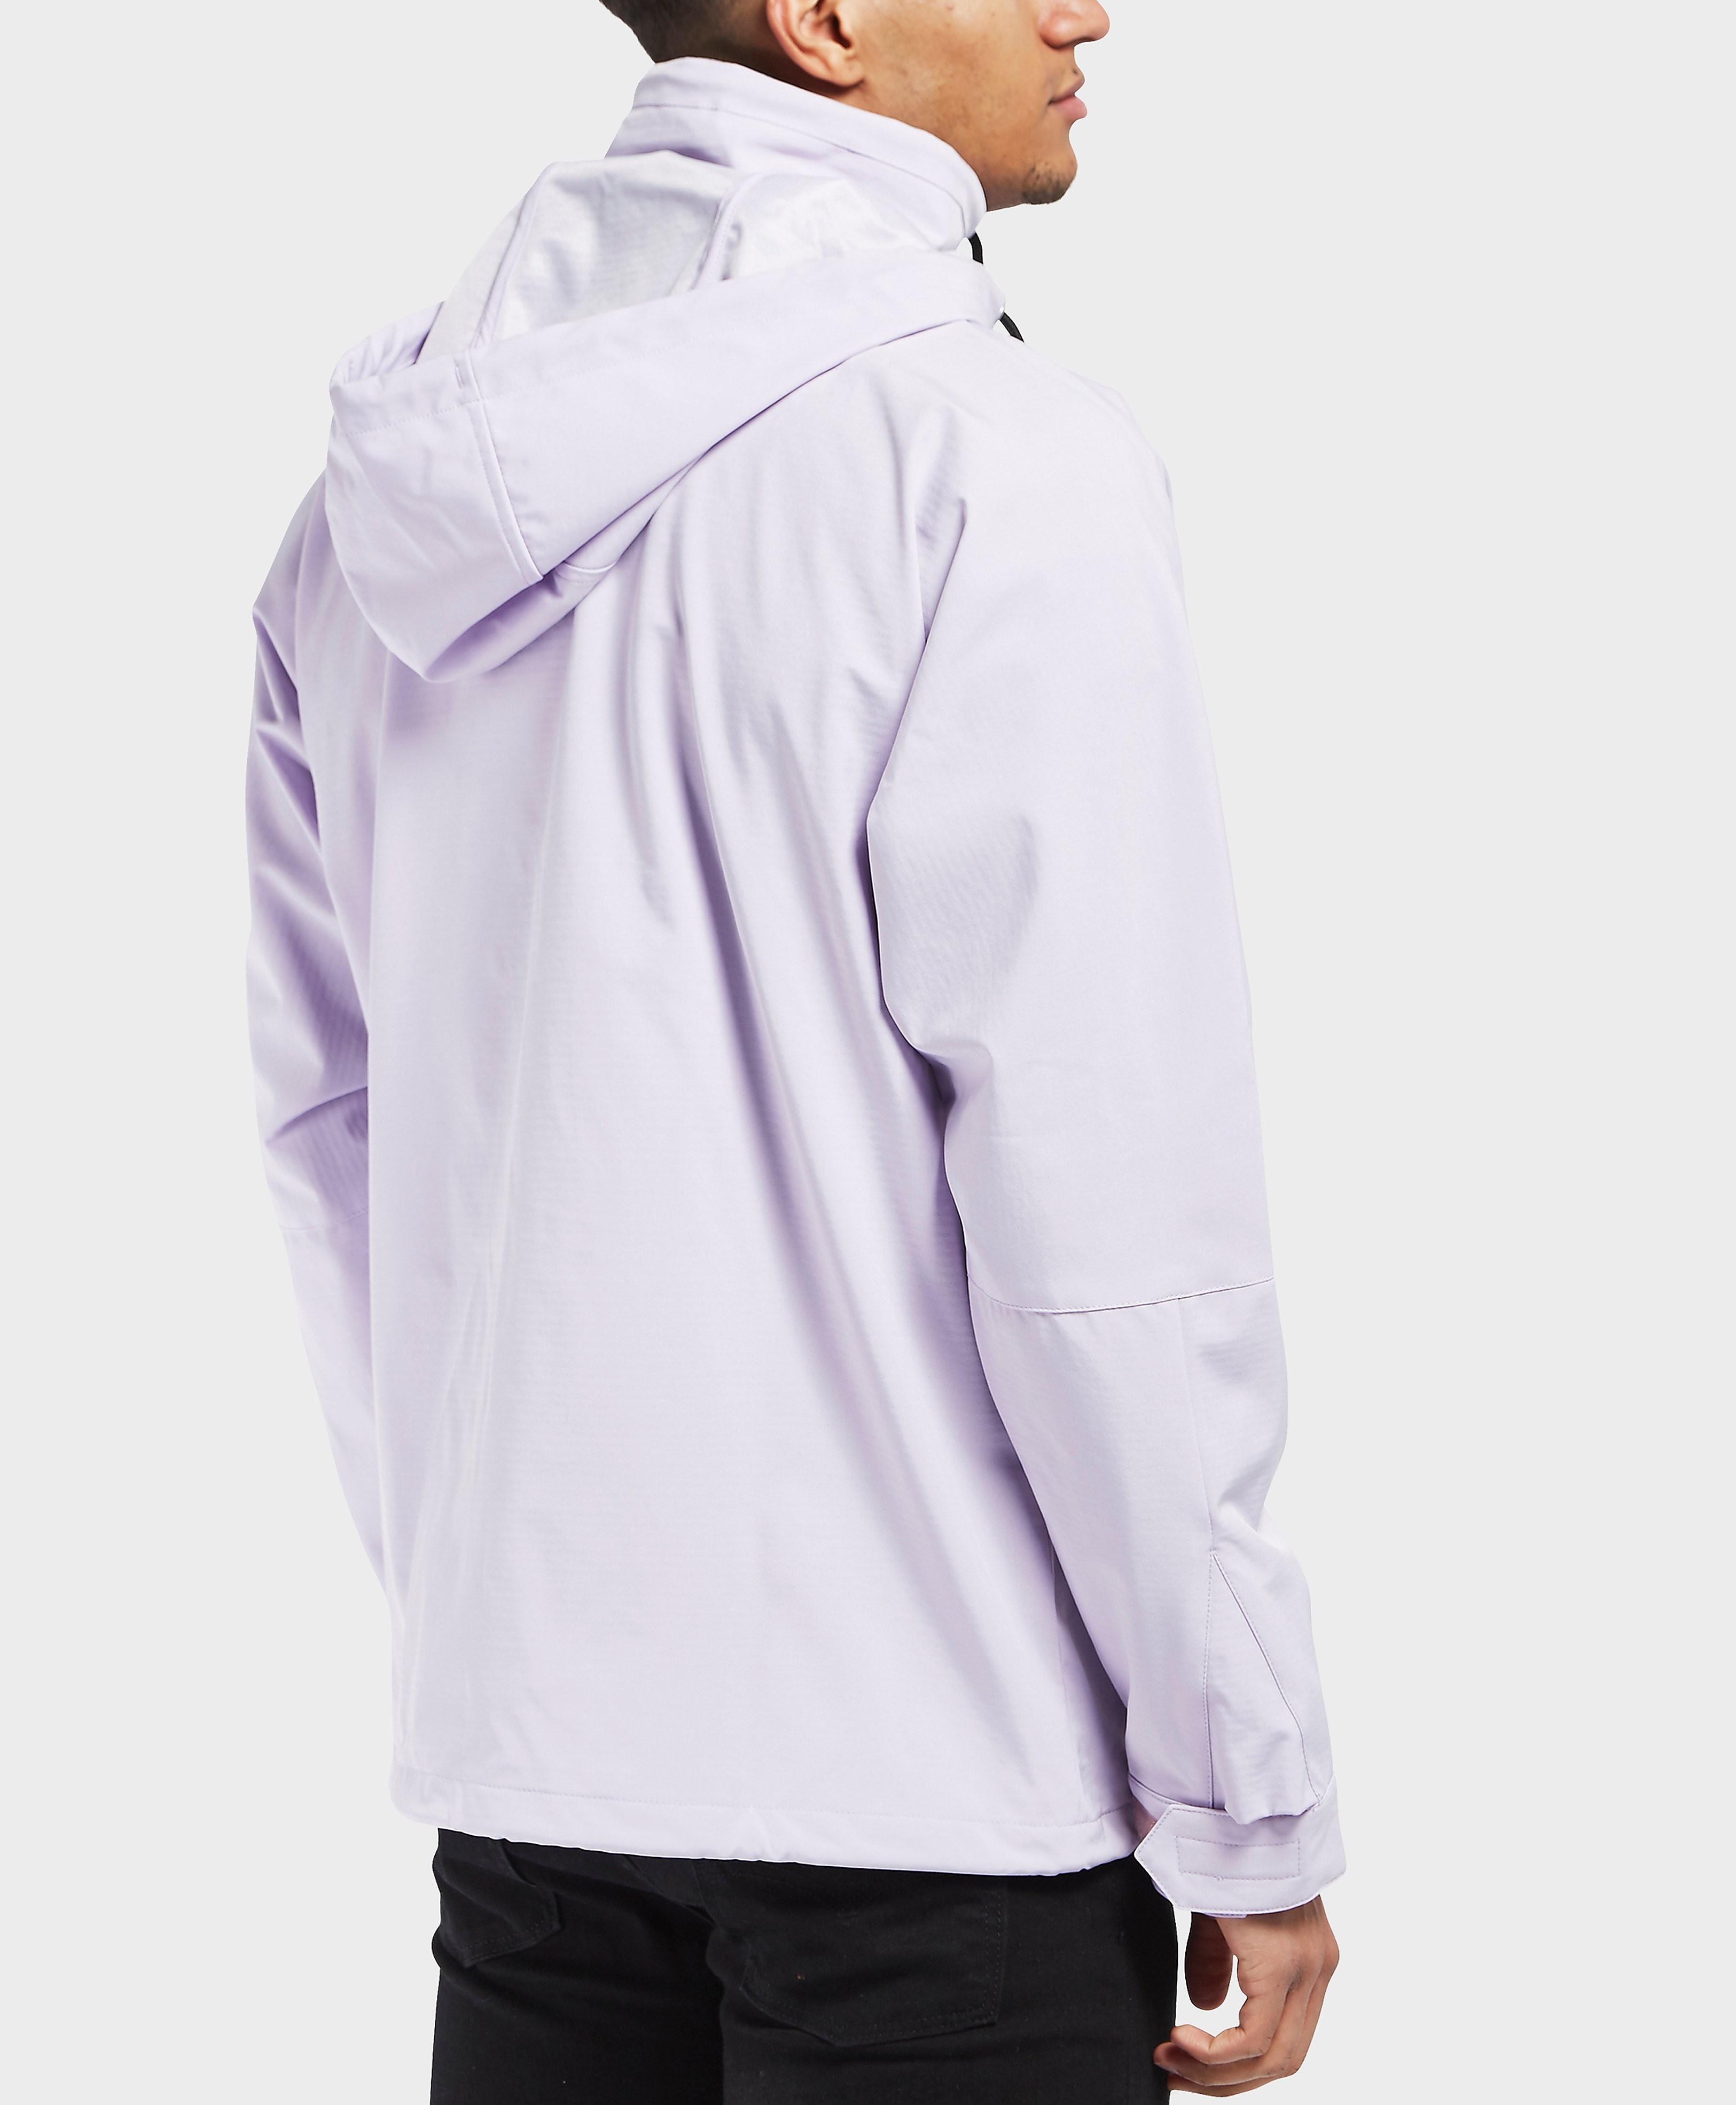 Fila Kaiten Half Zip Lightweight Jacket